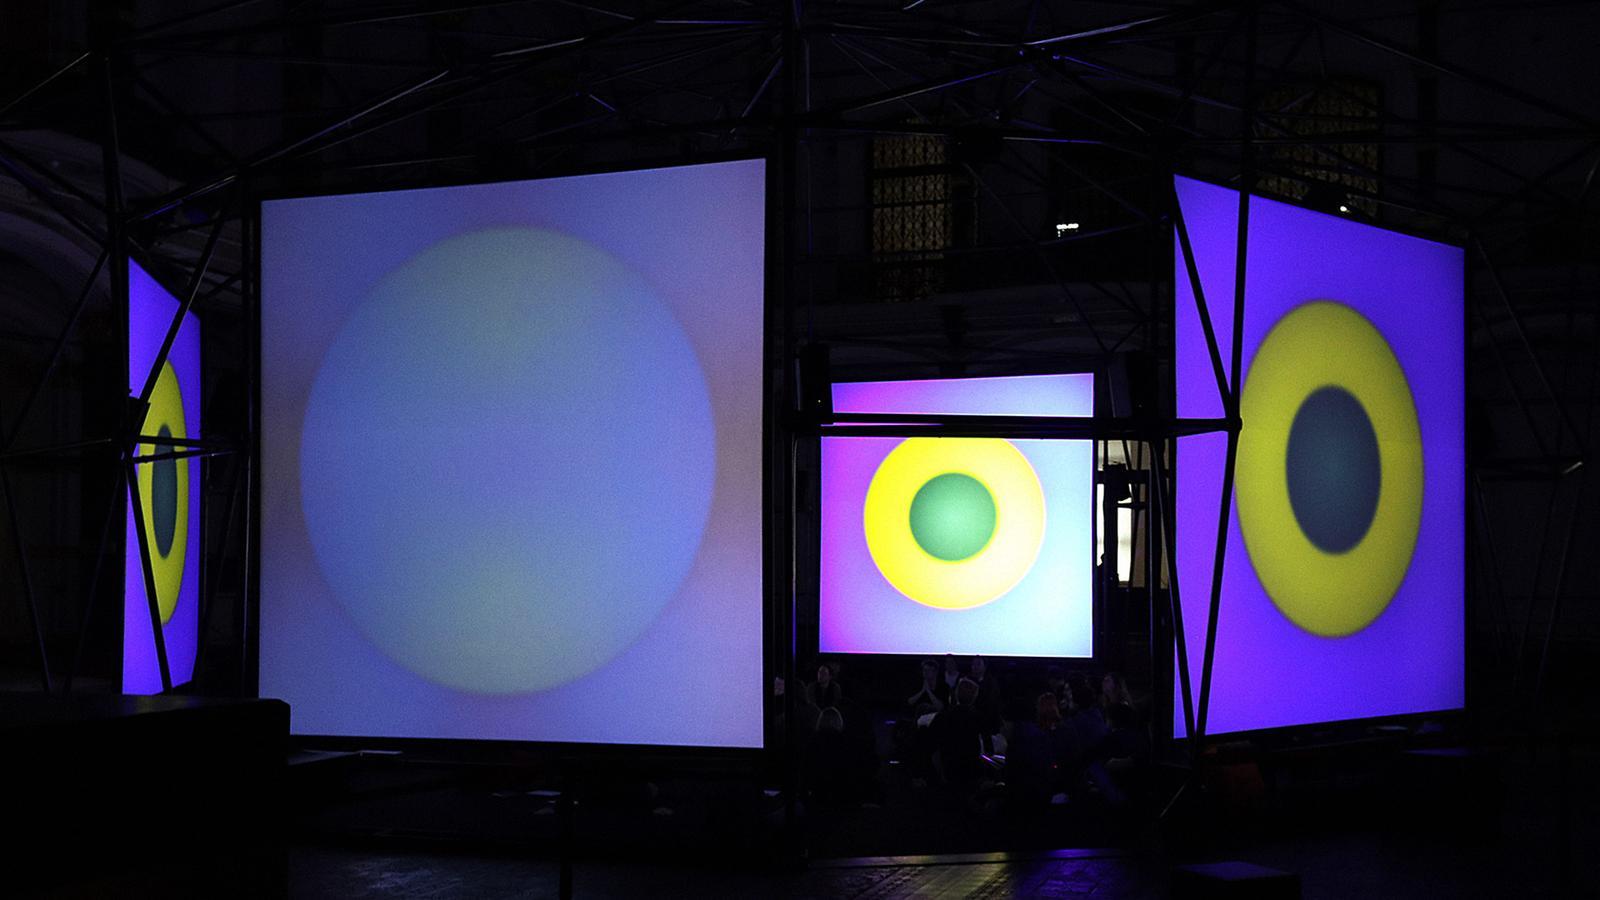 Hexadome Brian Eno Empty Formalism